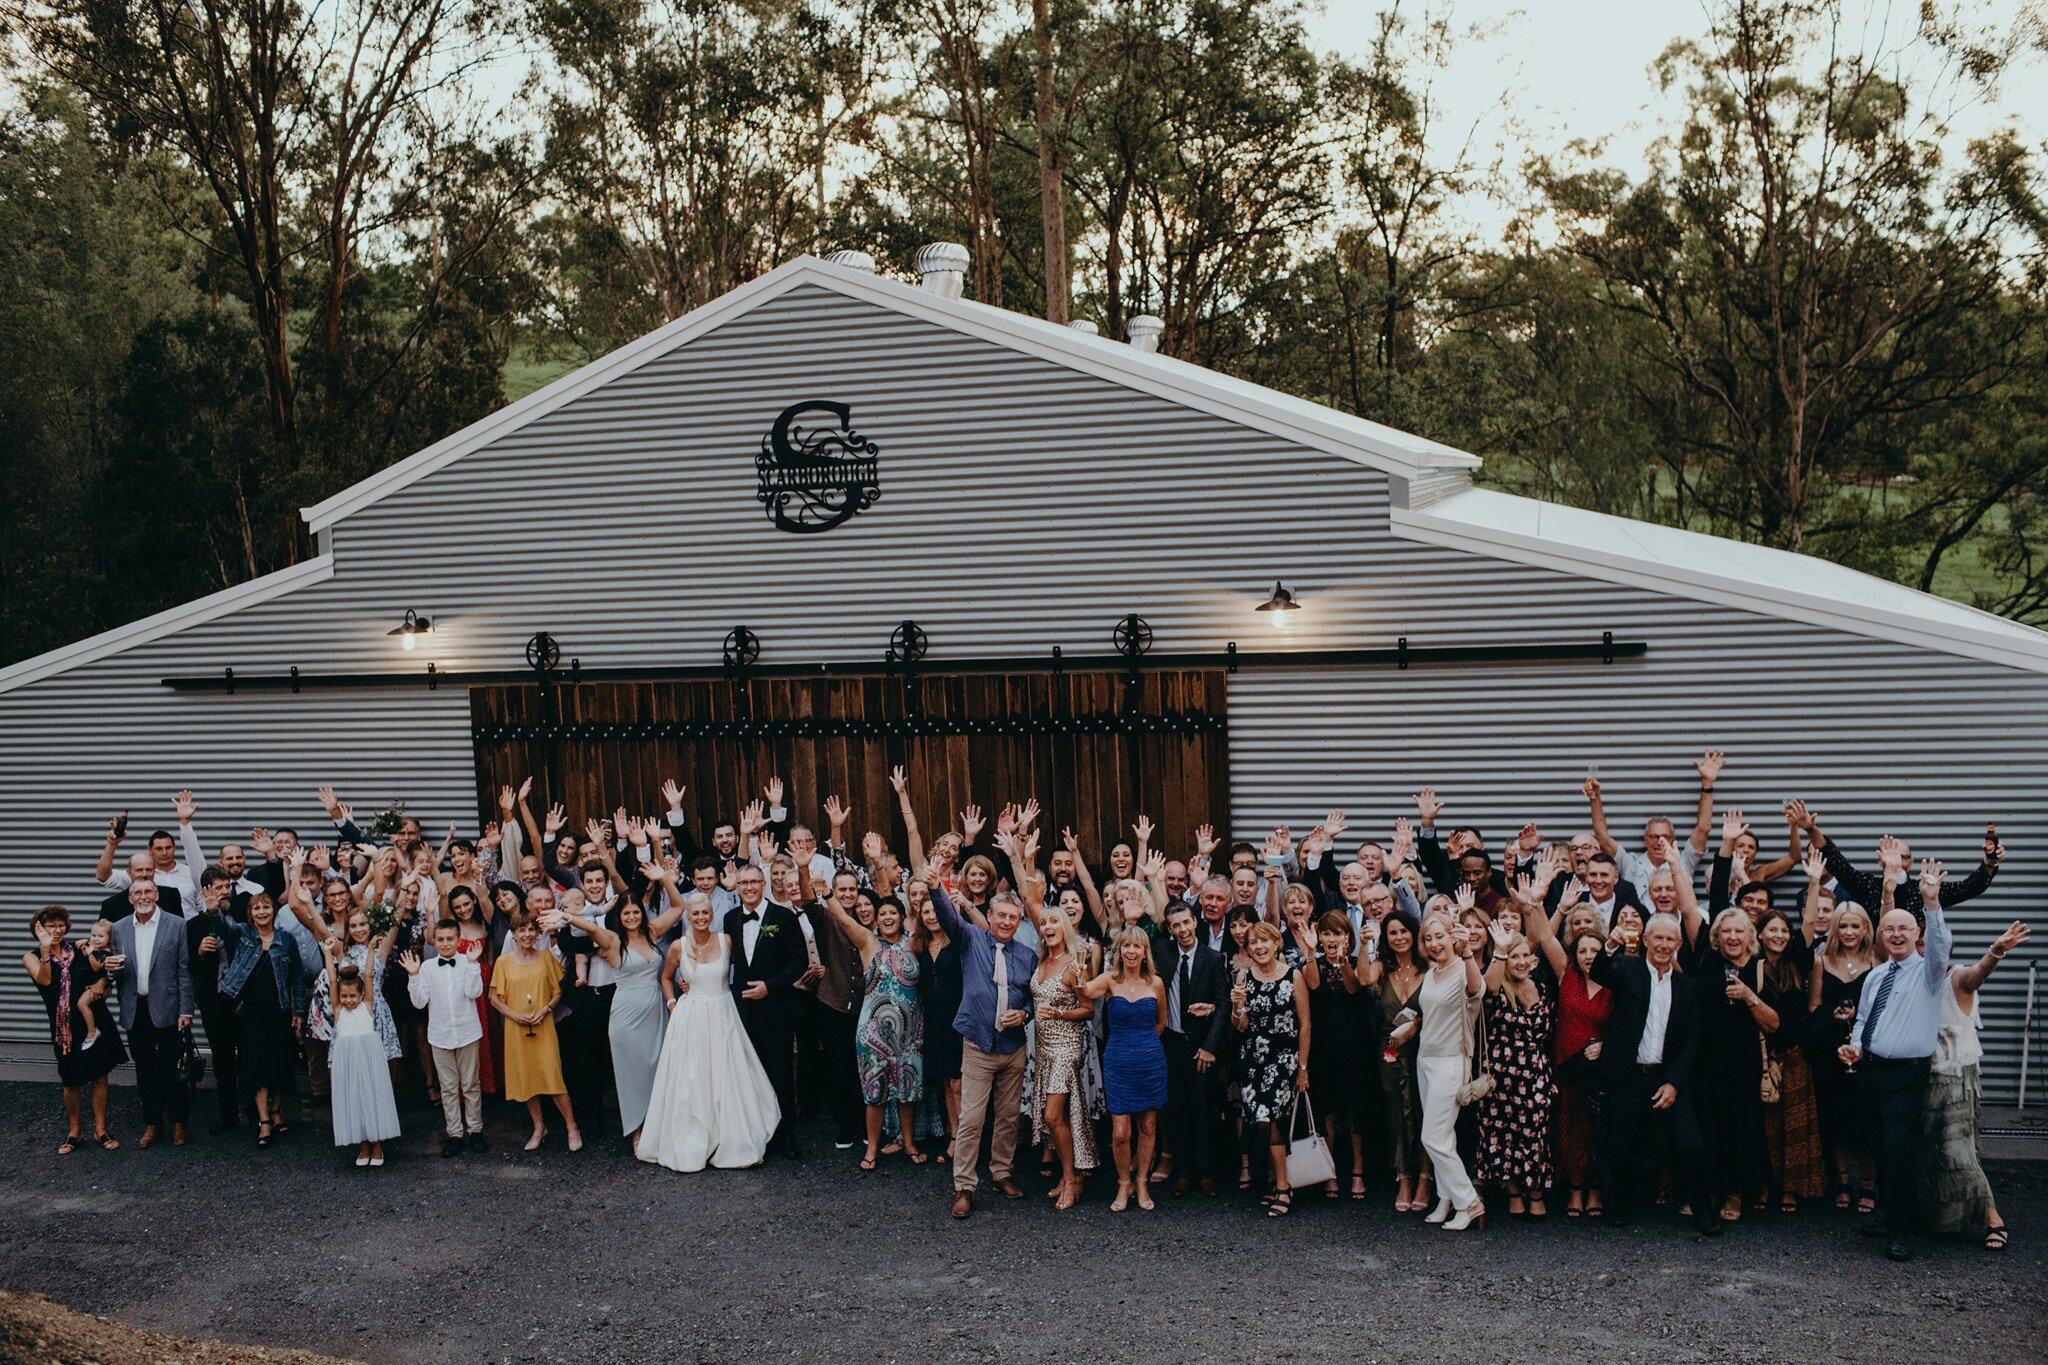 bespoke-bridal-shop-designer-helena-couture-designs-custom-wedding-dresses-gold-coast-brisbane-affordable-suzie07.jpg